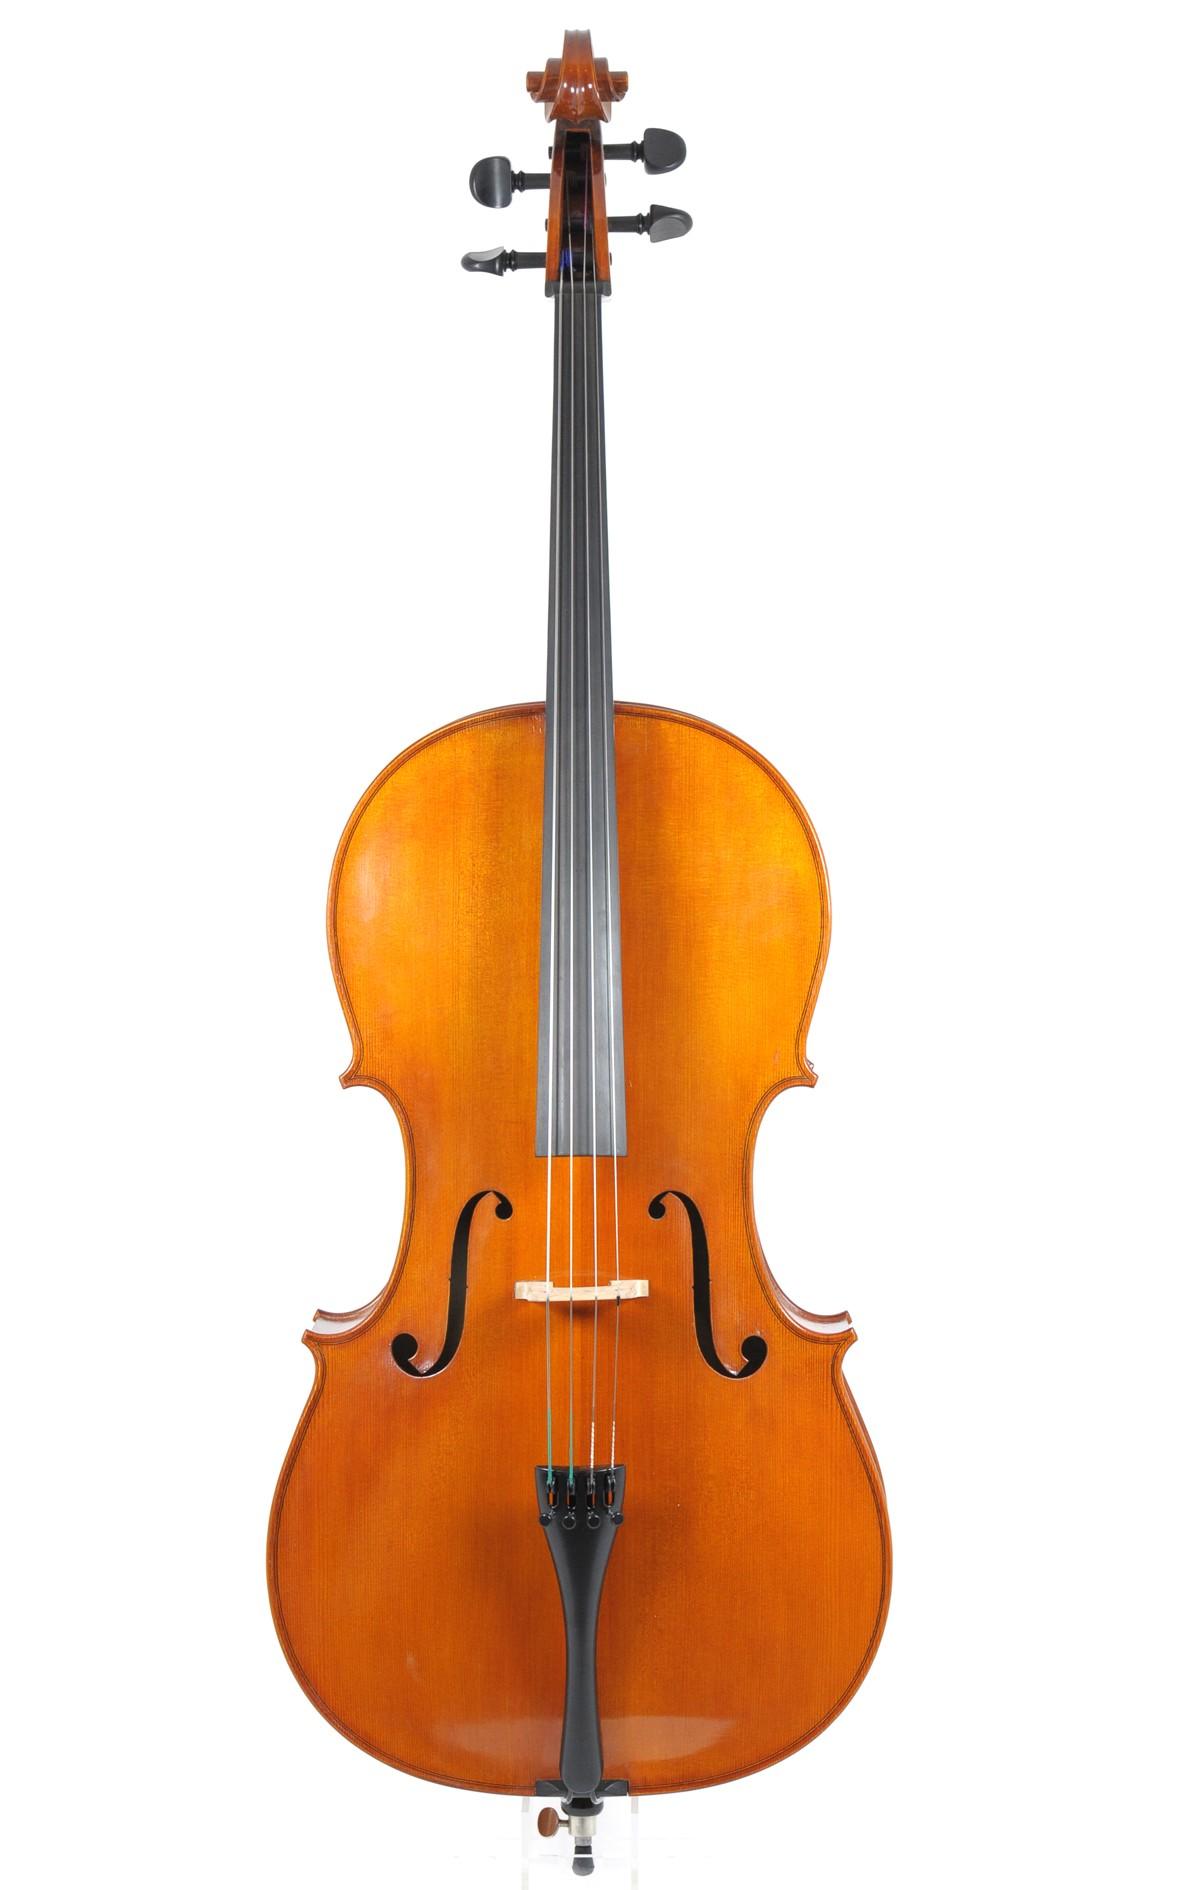 Rainer W. Leonhardt, violoncello approx. 1980 - top